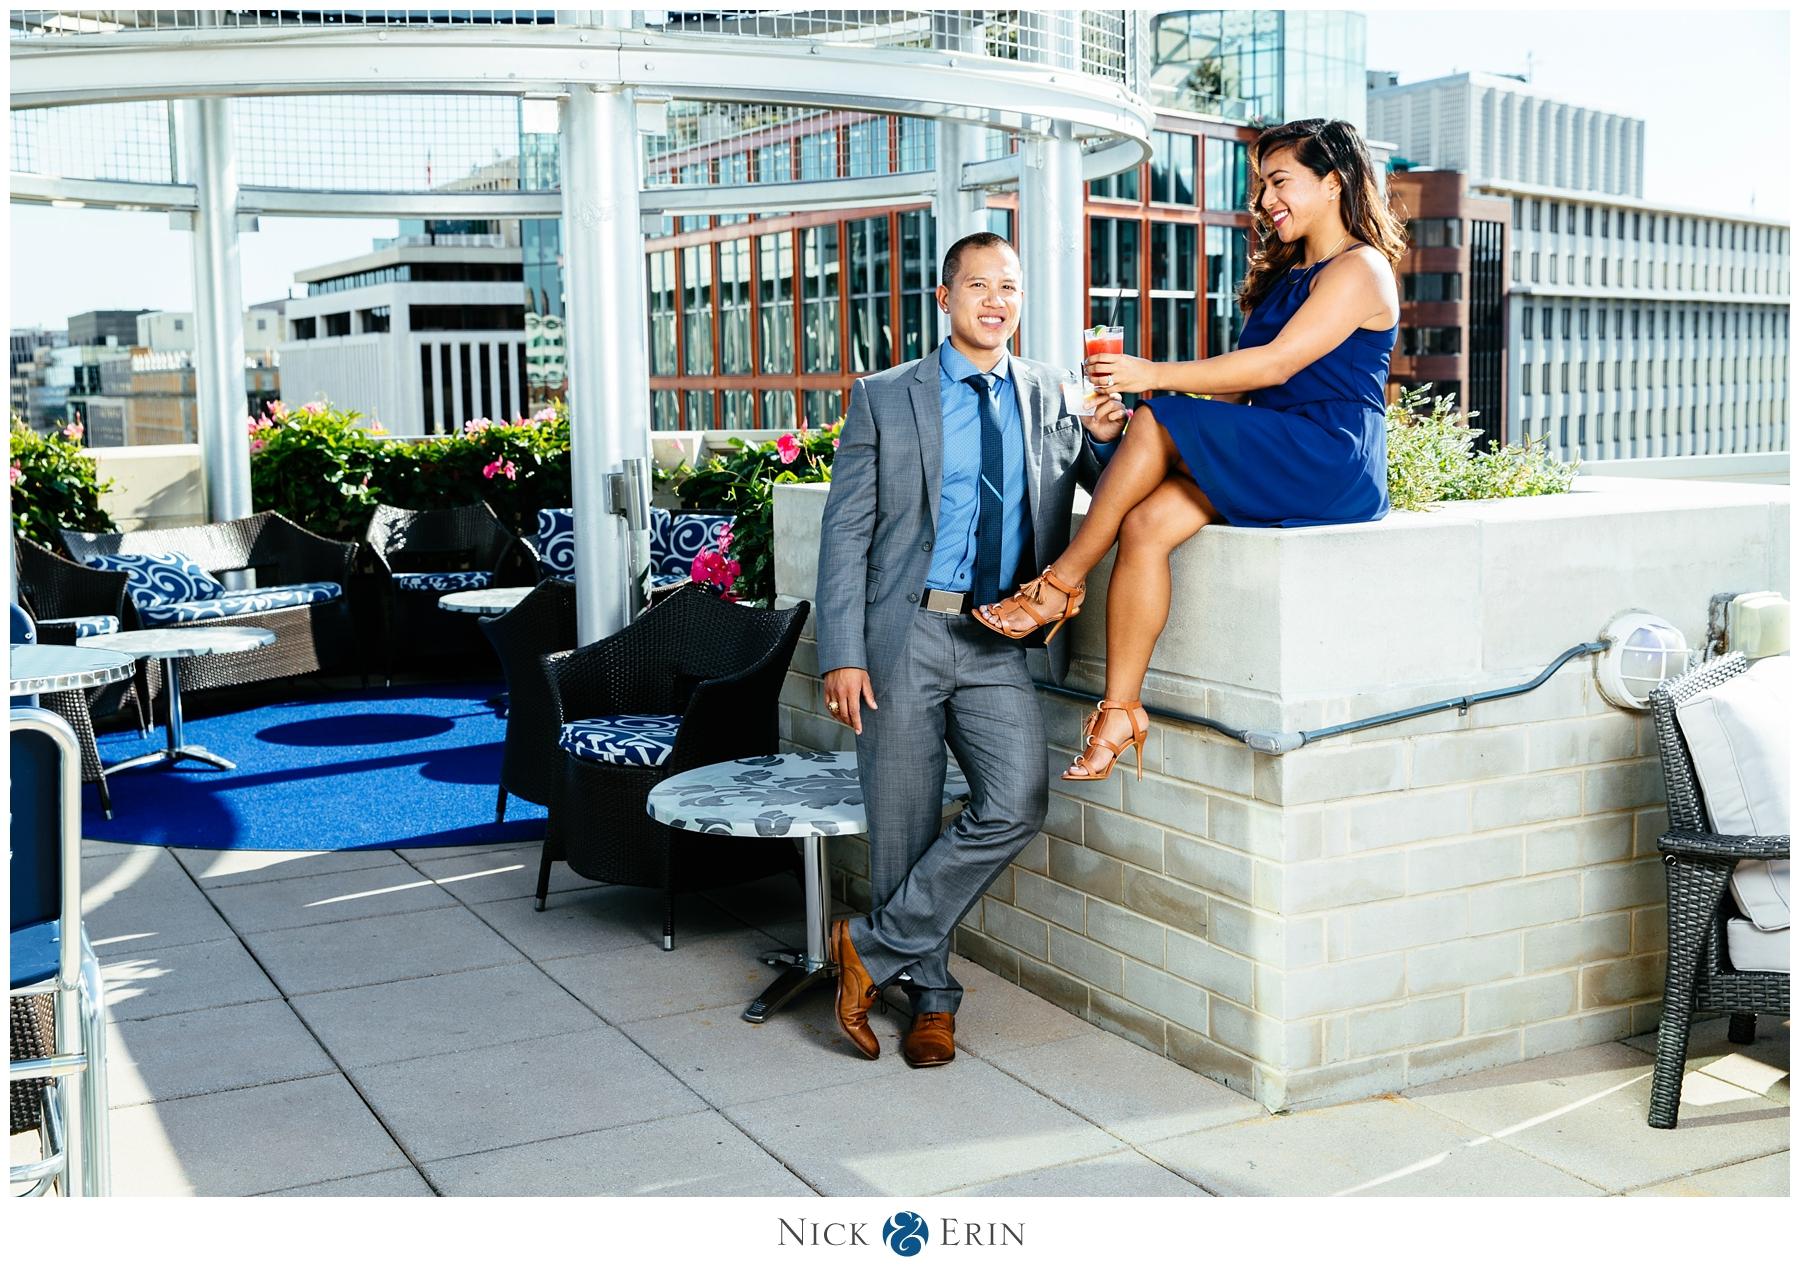 Donner_Photography_Washington DC Engagement Session_Jenny Mae & Vic_0013